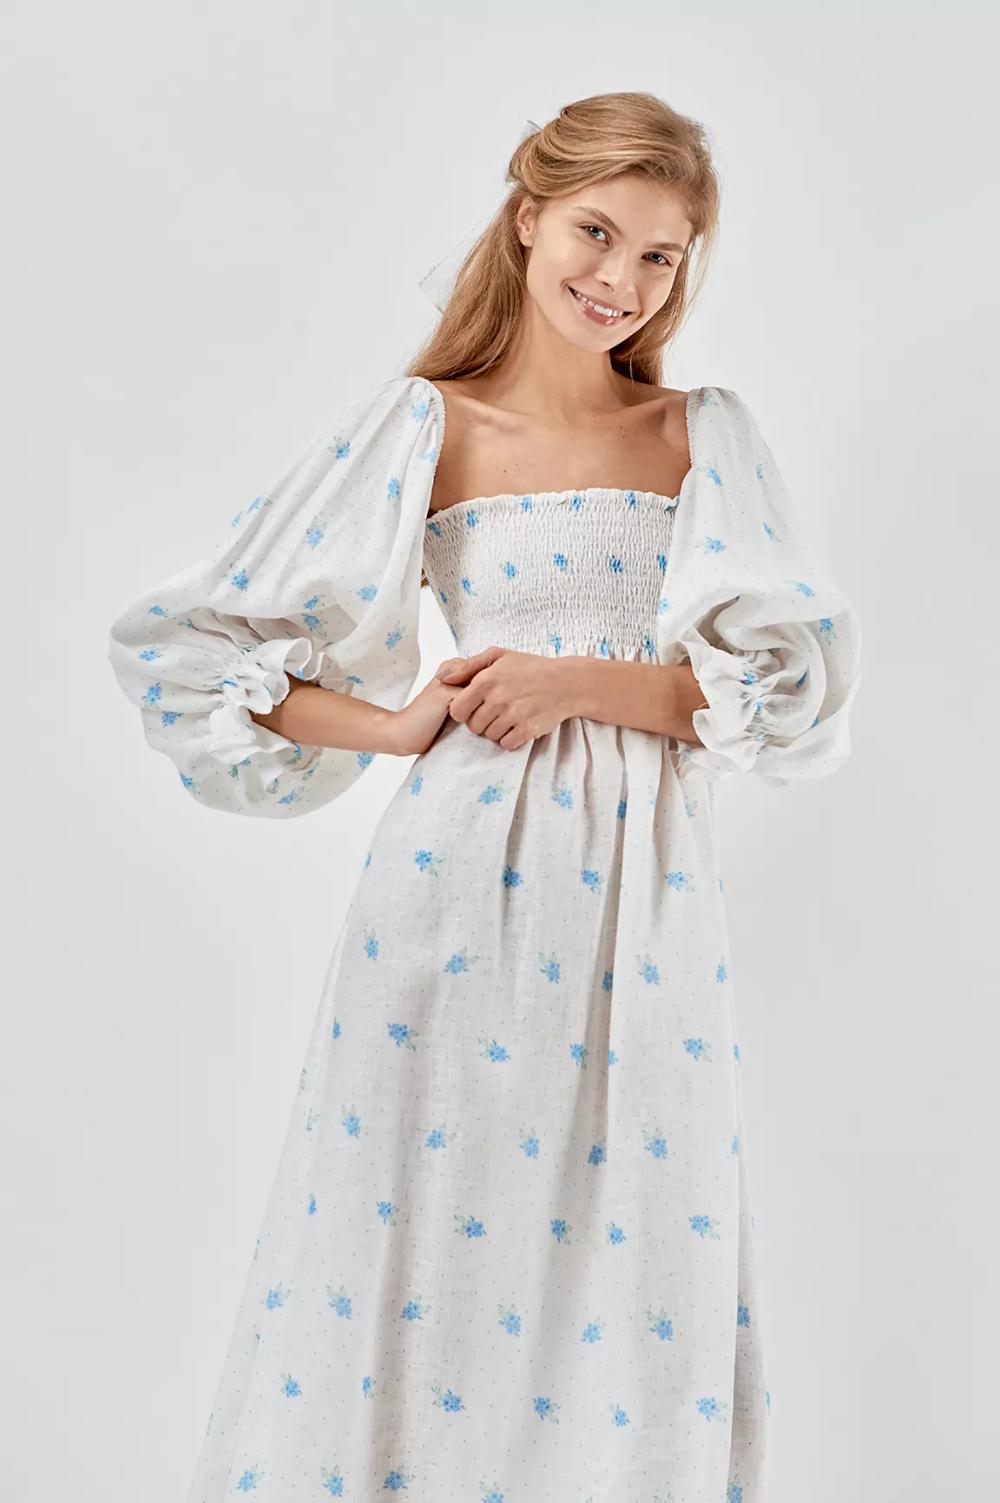 Atlanta Linen Dress In Linum Print Sleeper In 2020 Dresses Linen Dress Fashion [ 1503 x 1000 Pixel ]